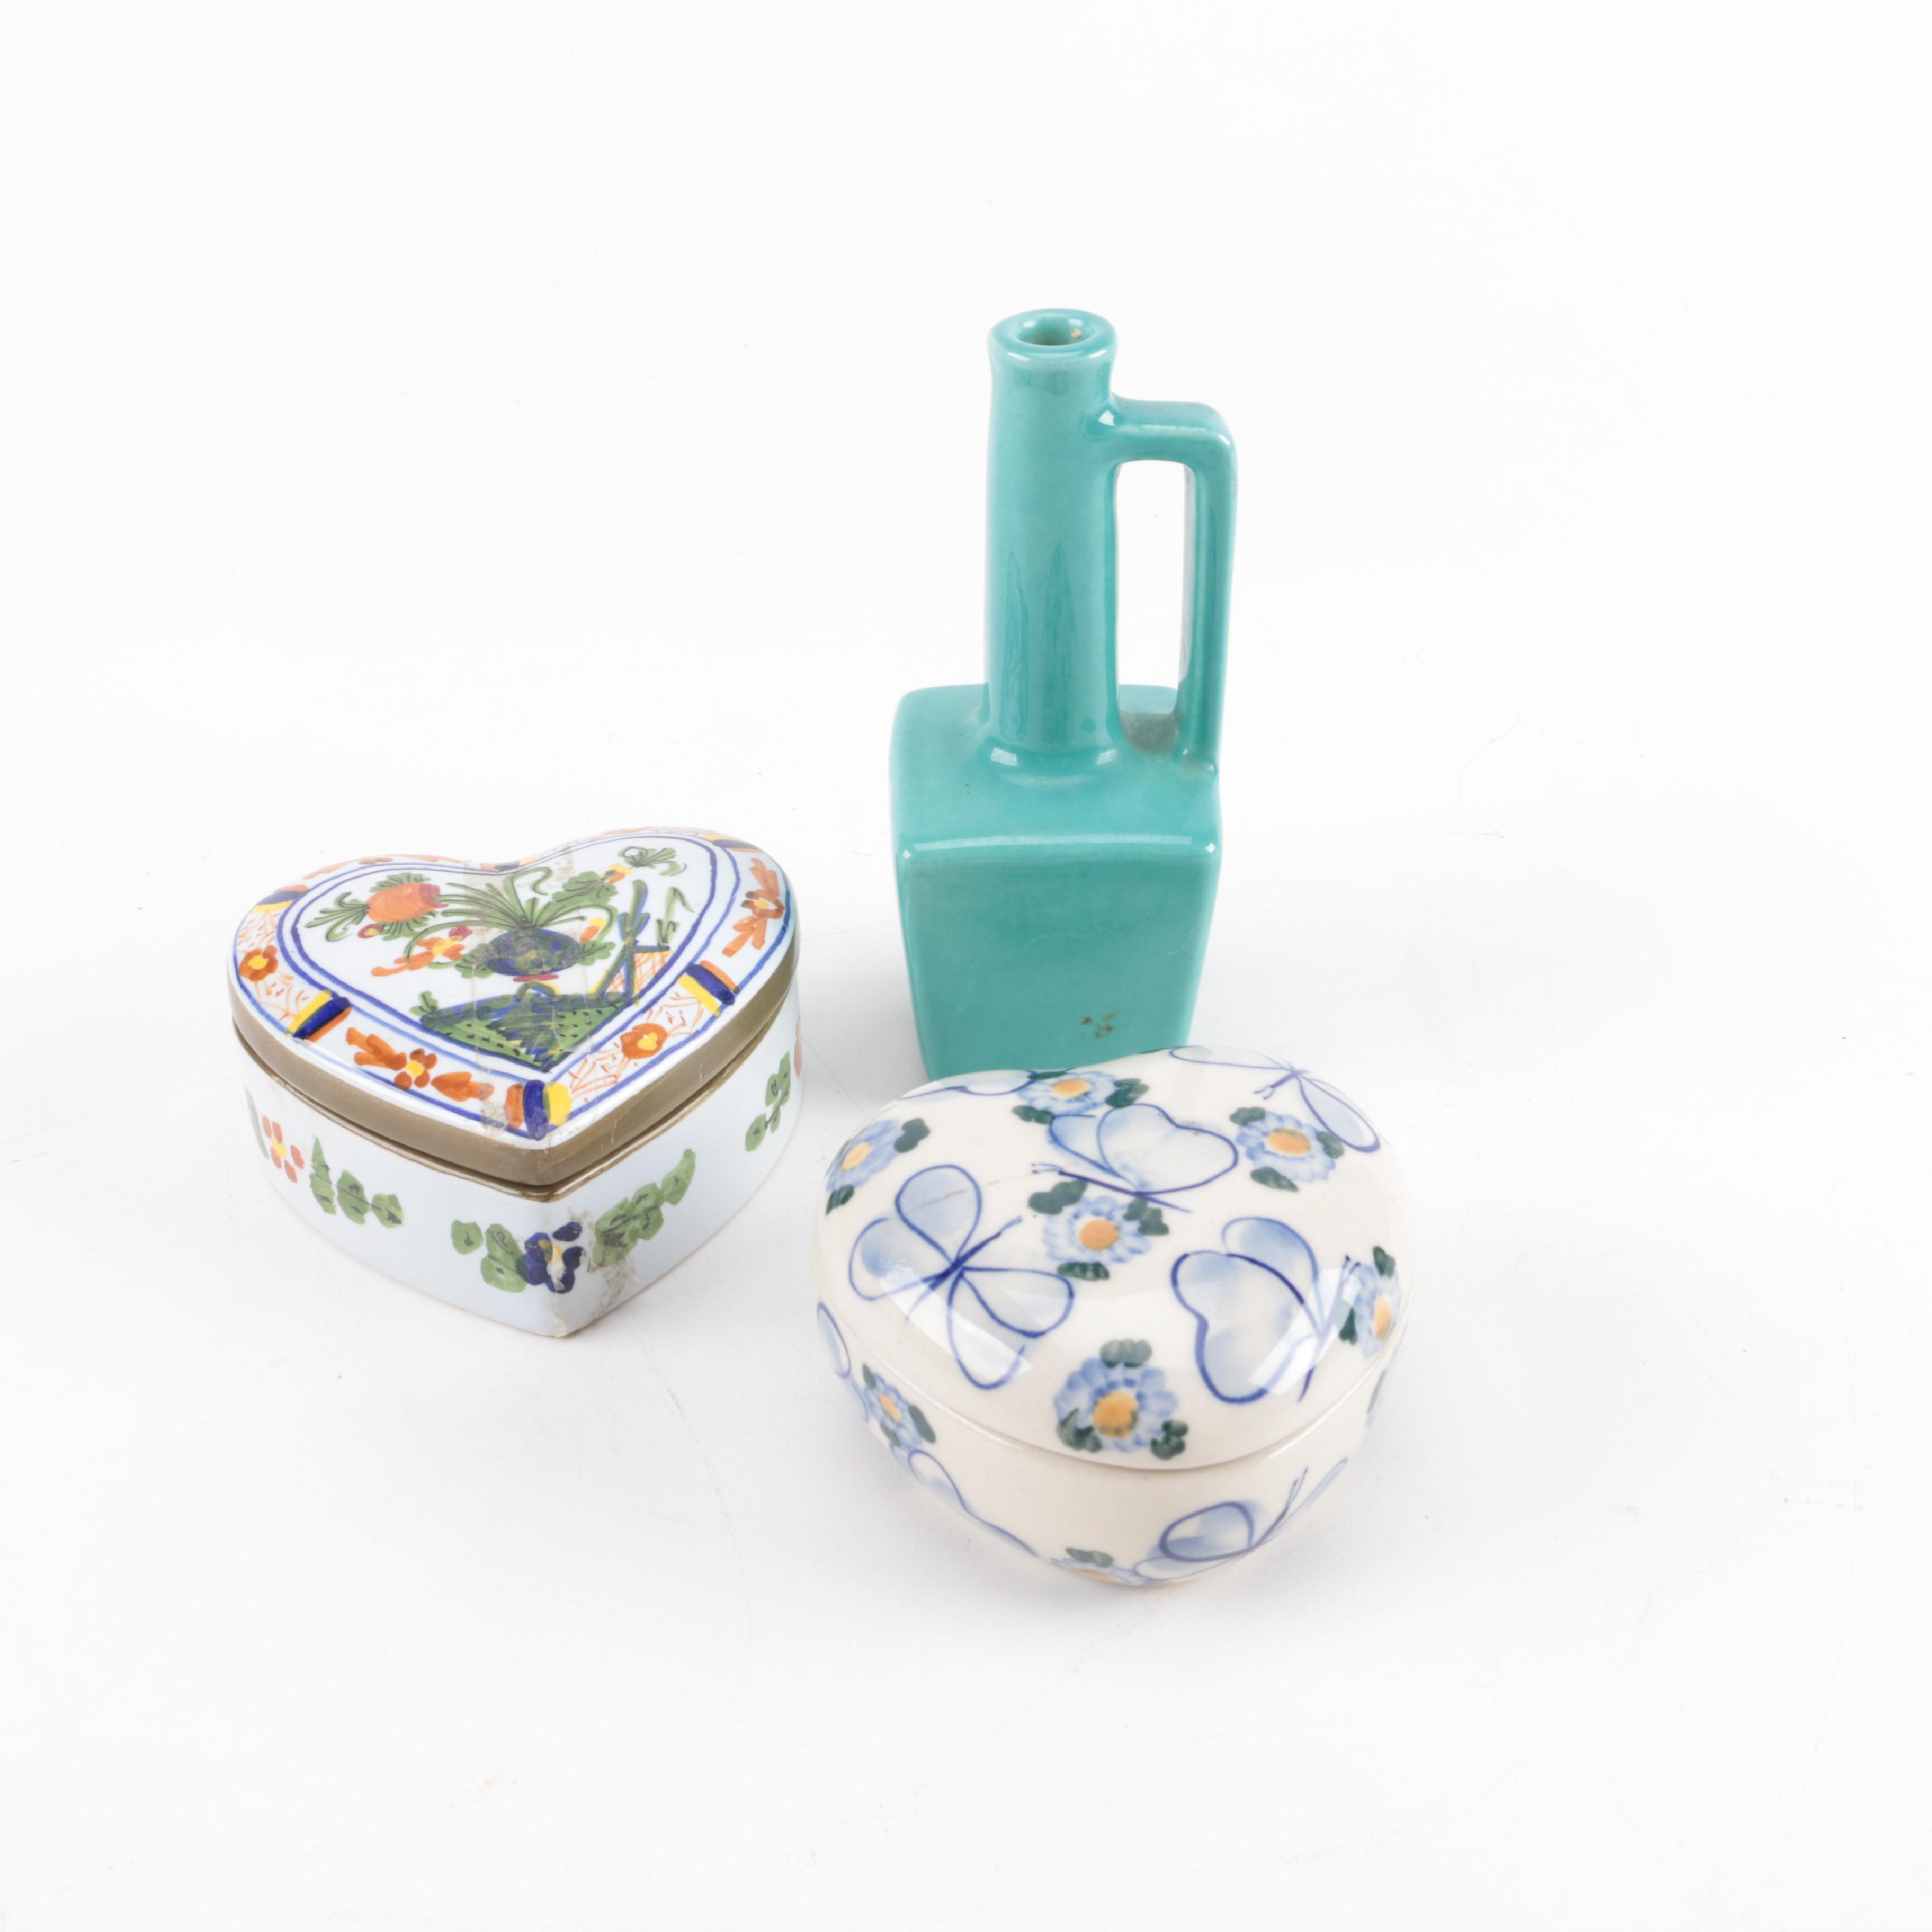 Ceramic Trinket Boxes and Vase